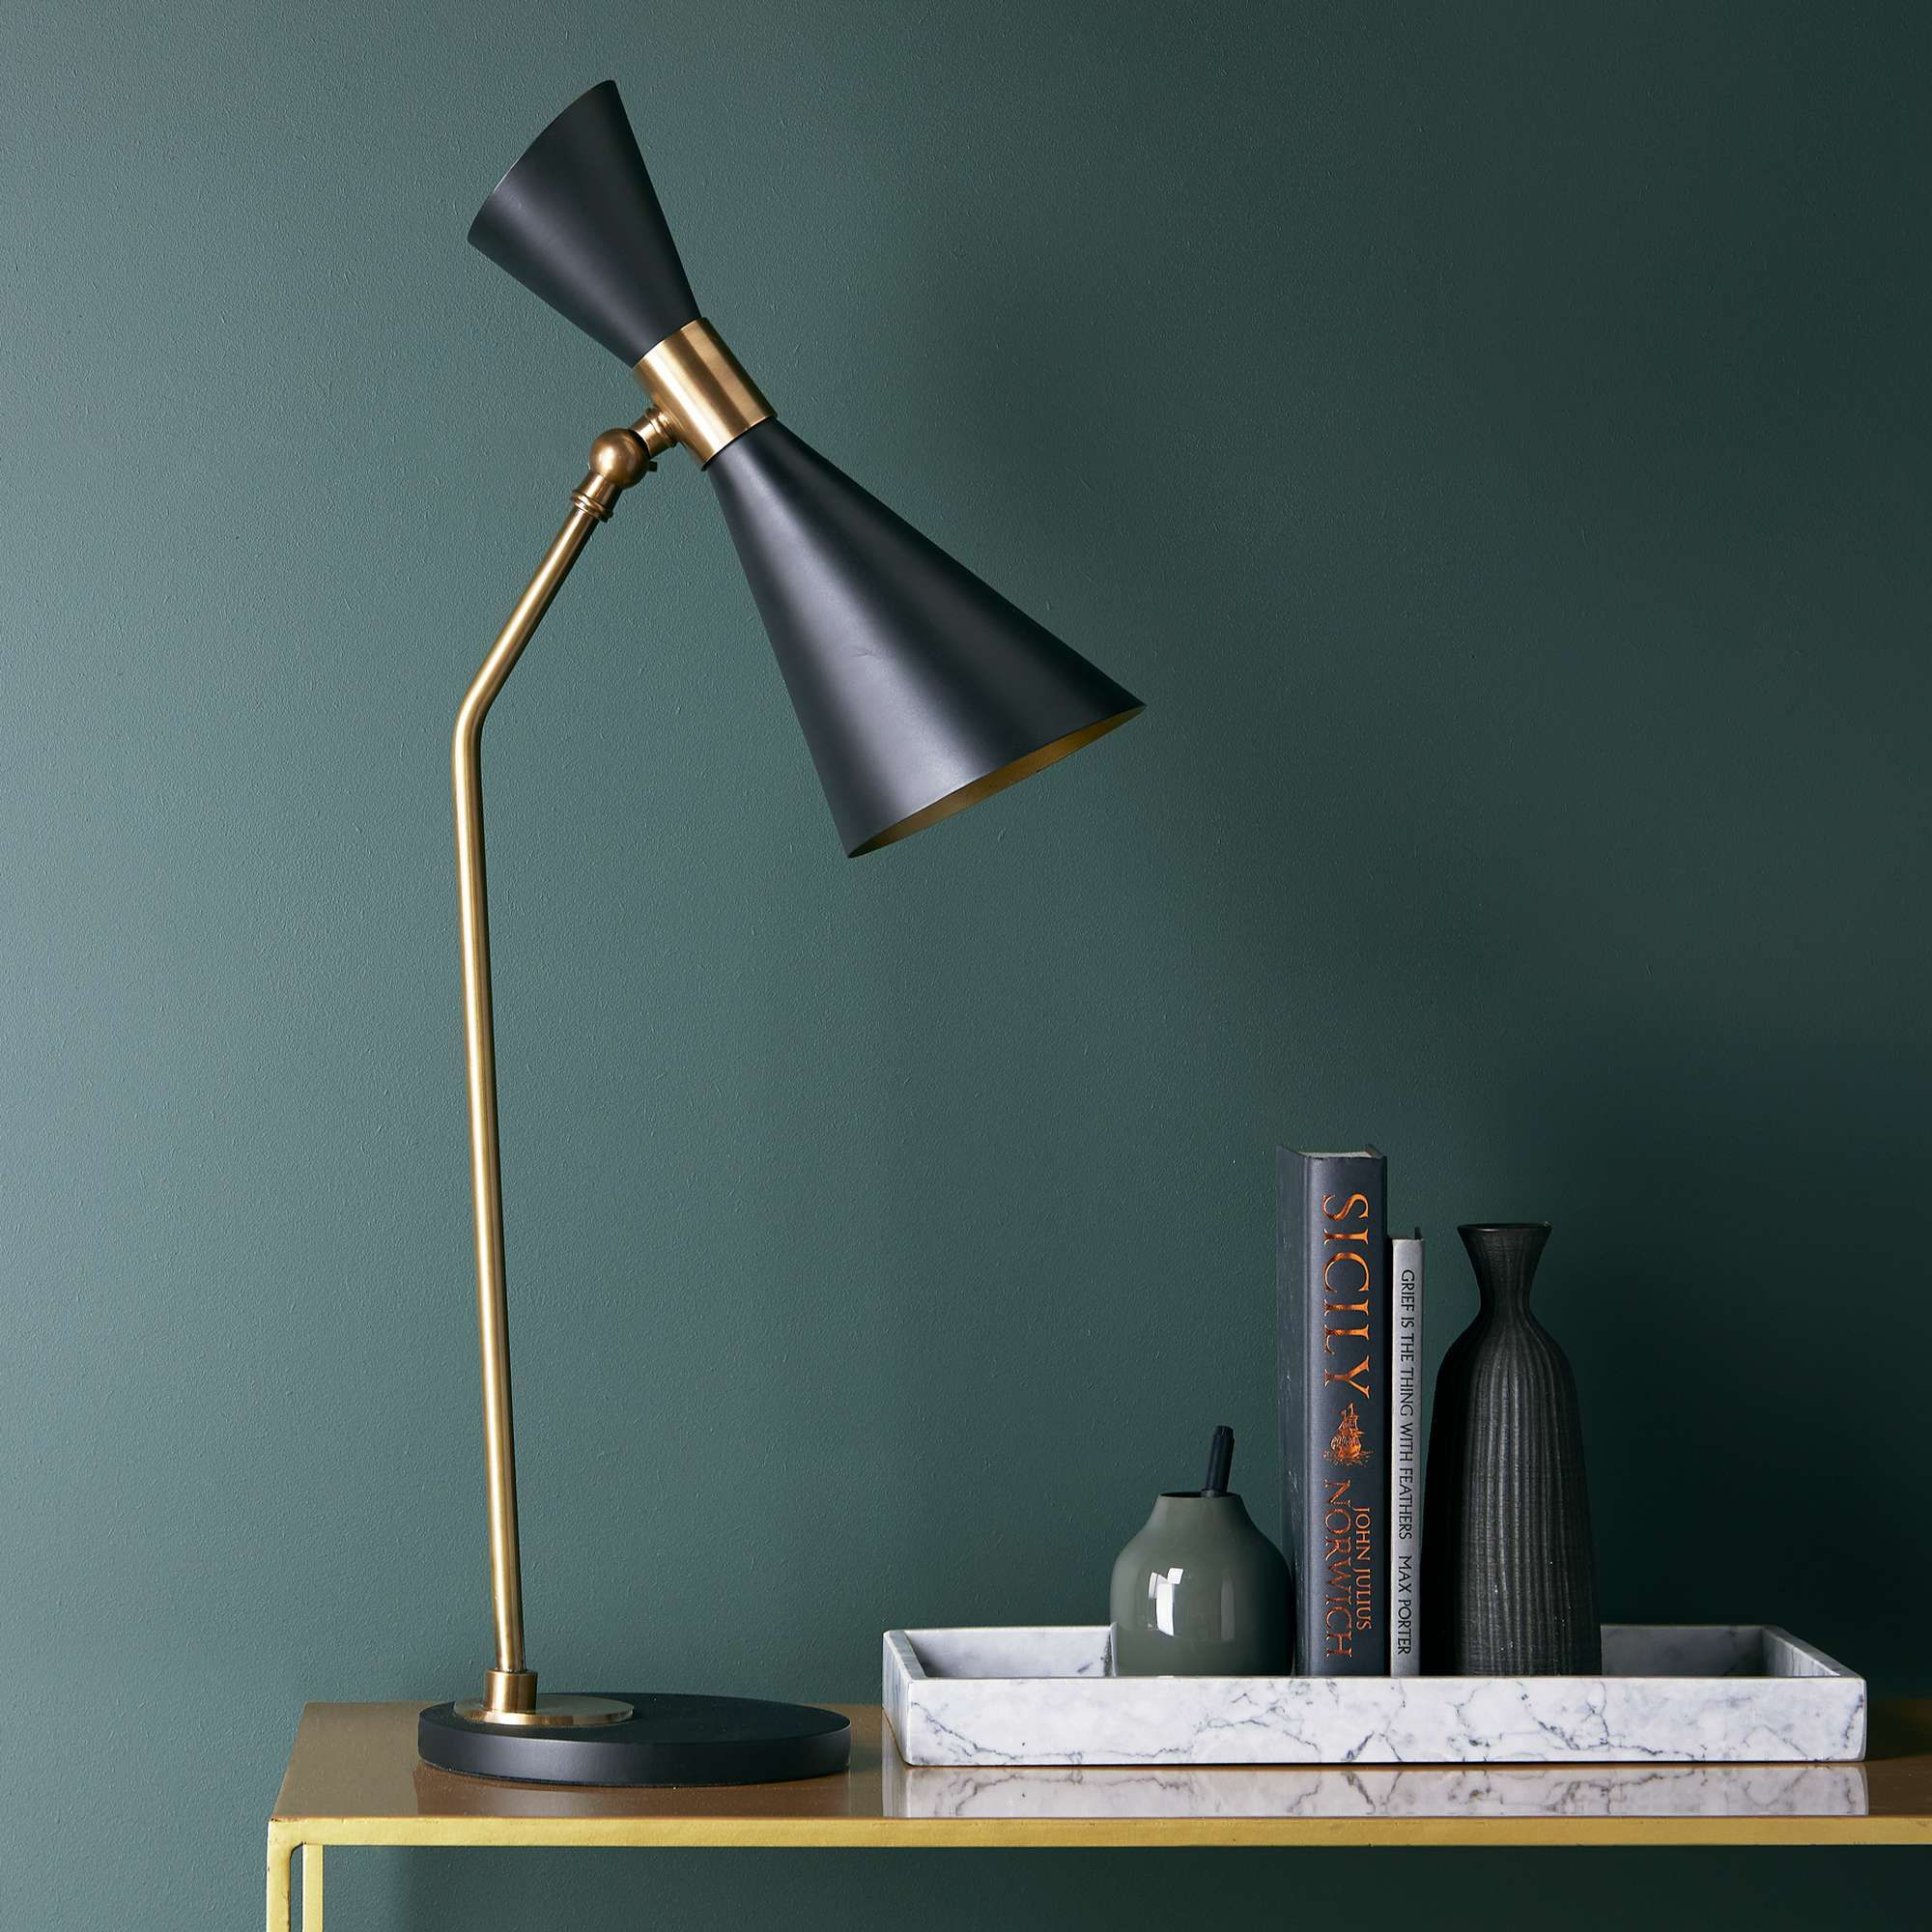 Bow Tie desk light in black in 2020   Desk light, Office